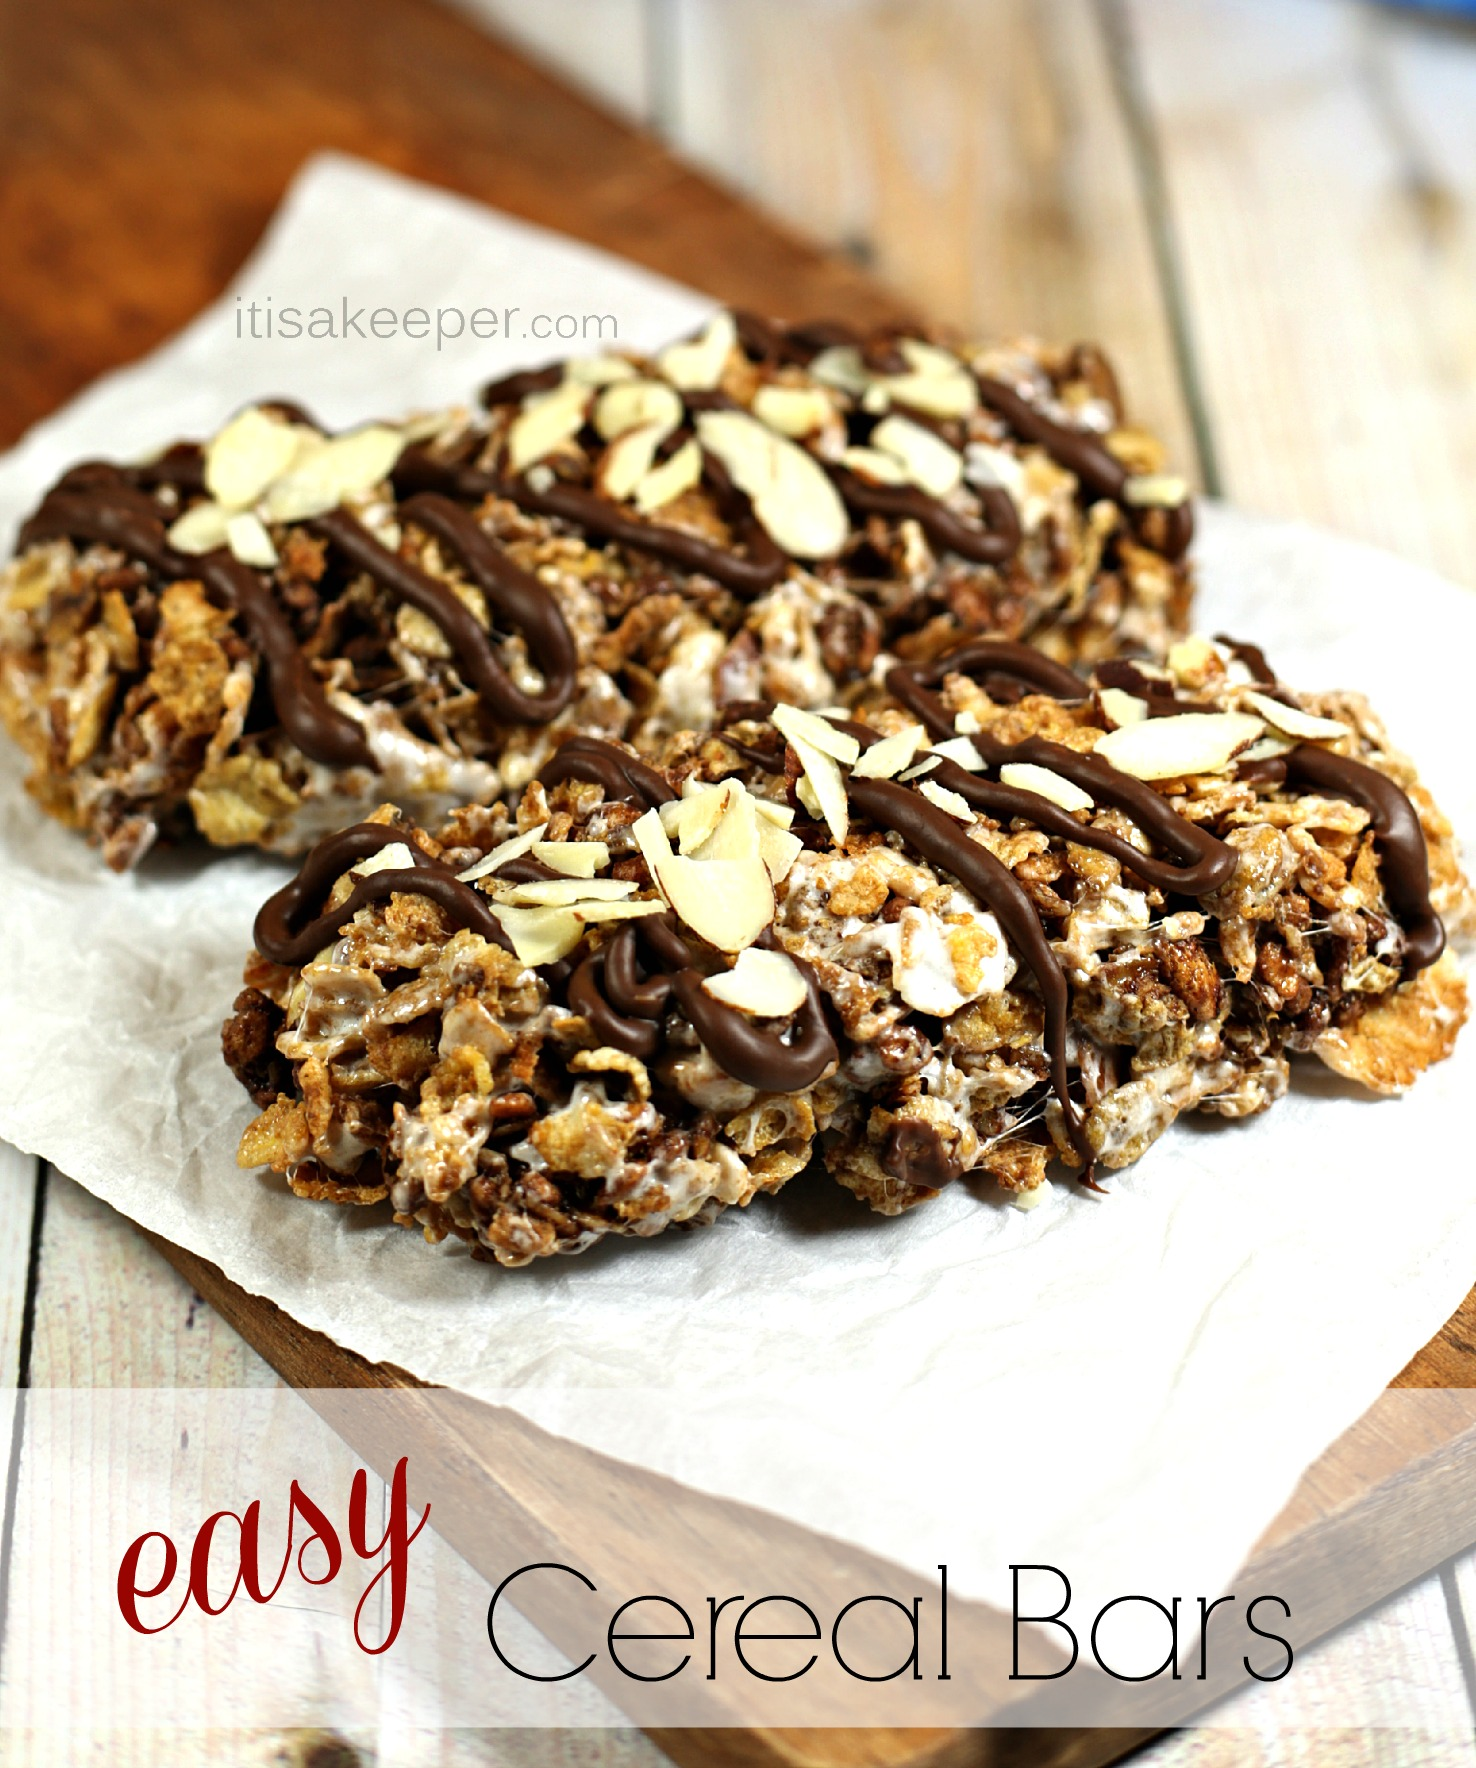 Easy Breakfast Recipes: Cereal Bars